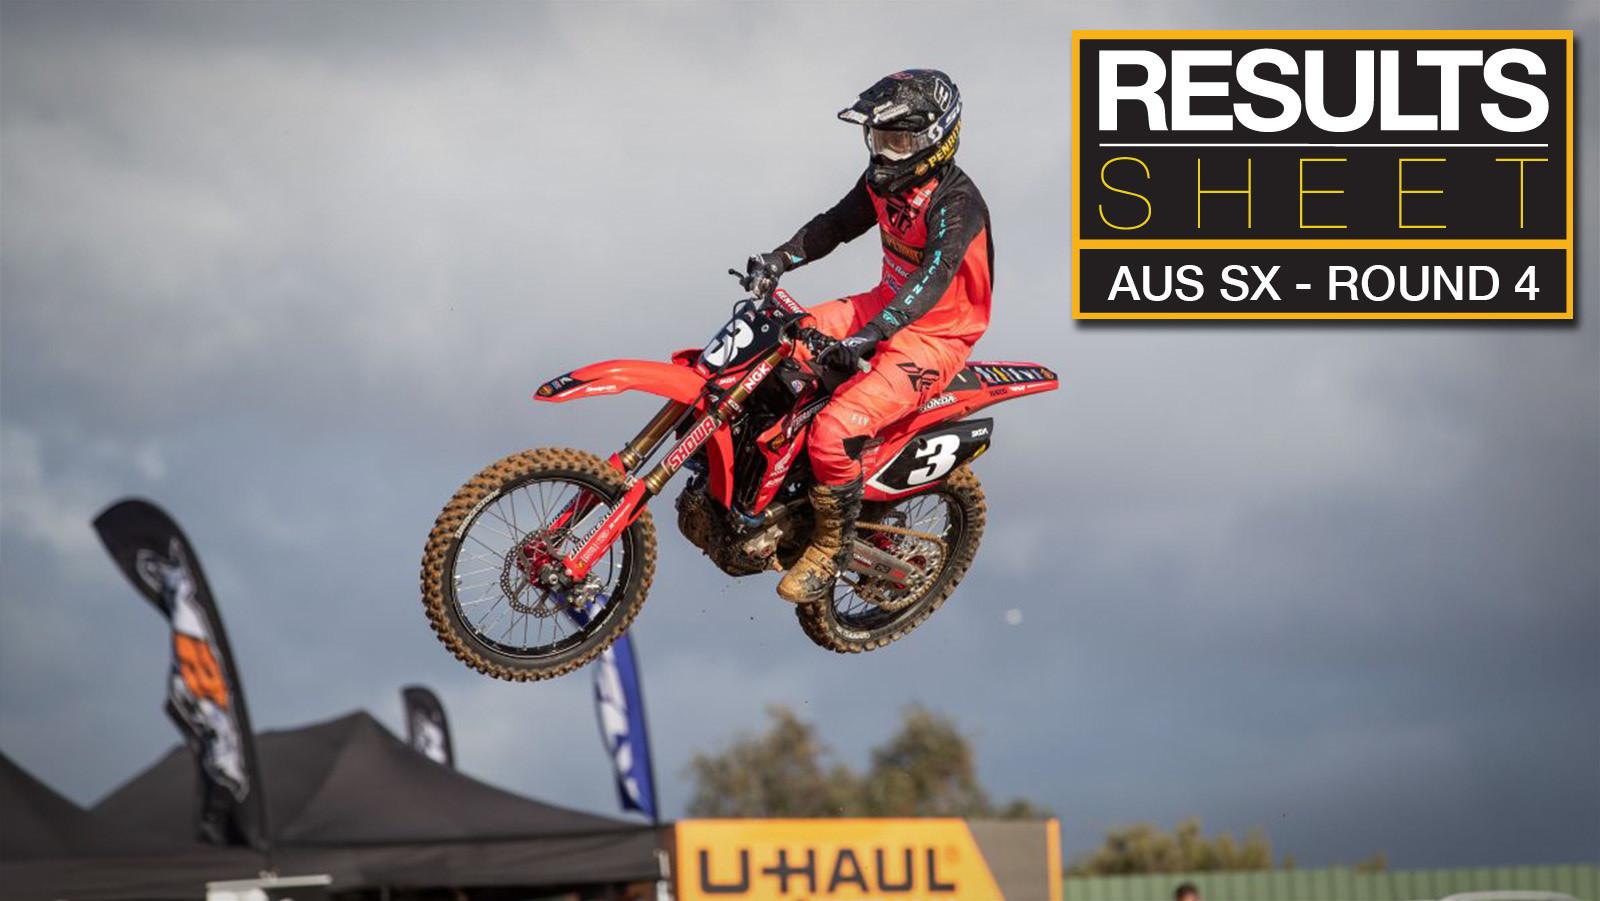 Results Sheet: 2019 Australian Supercross Championship - Round 4